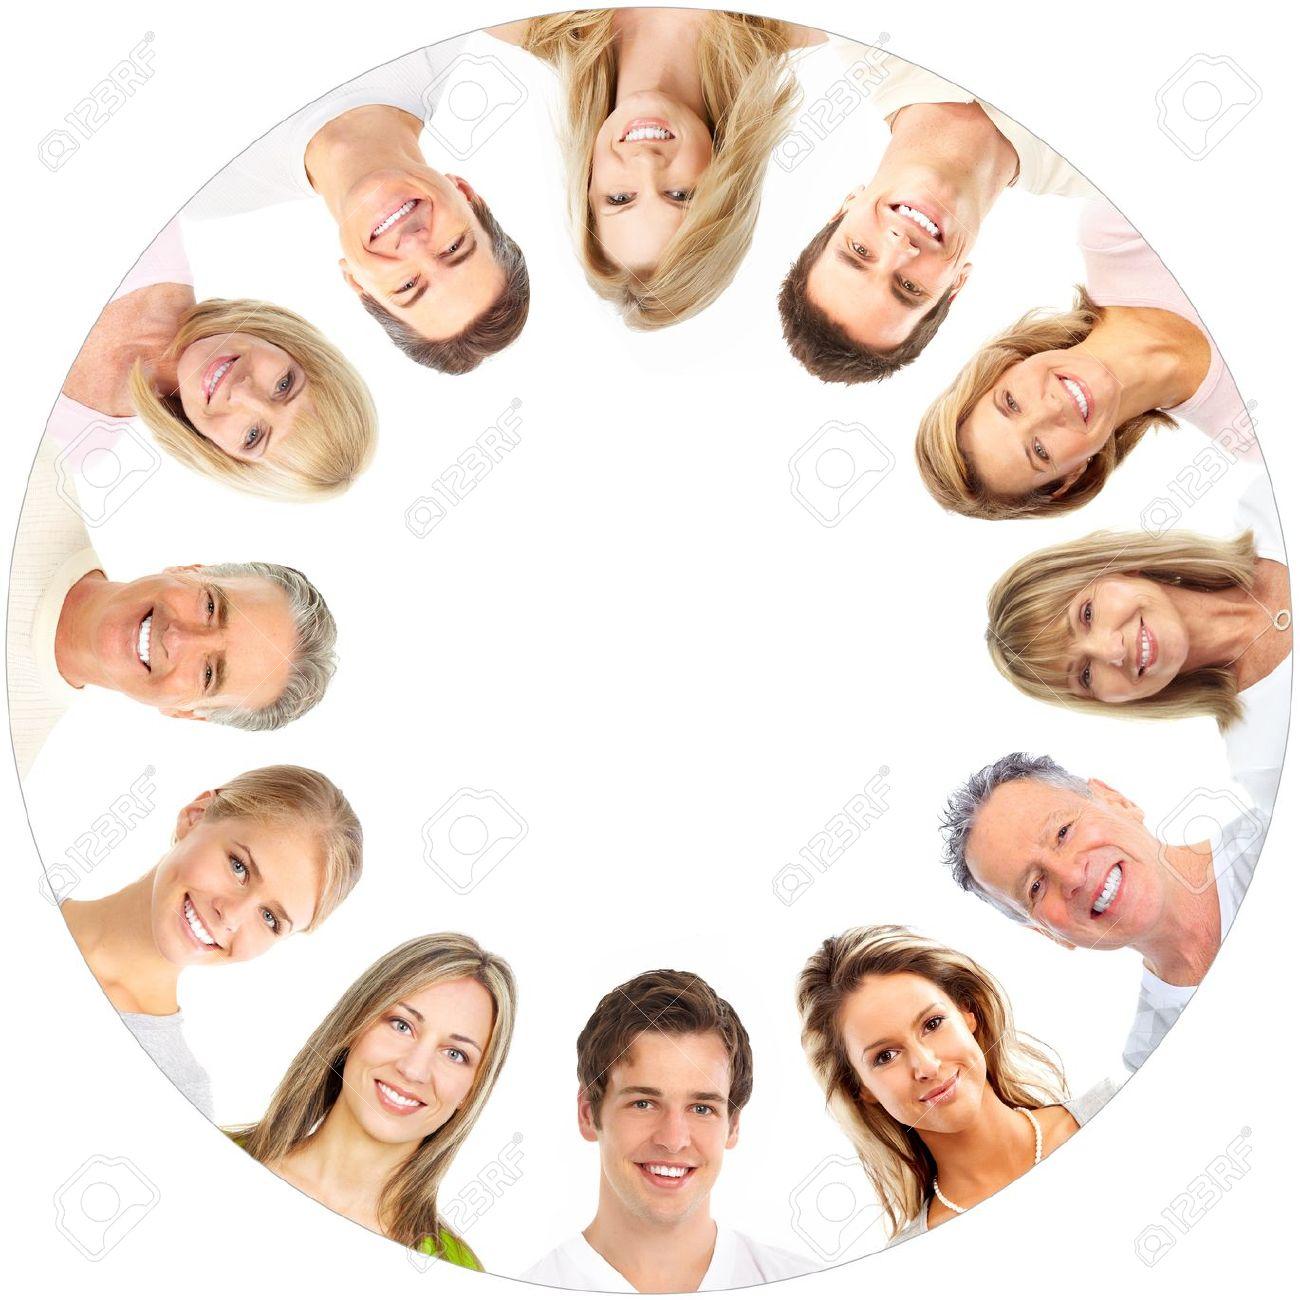 Lihat Juga: Gambar Orang Sedih :(